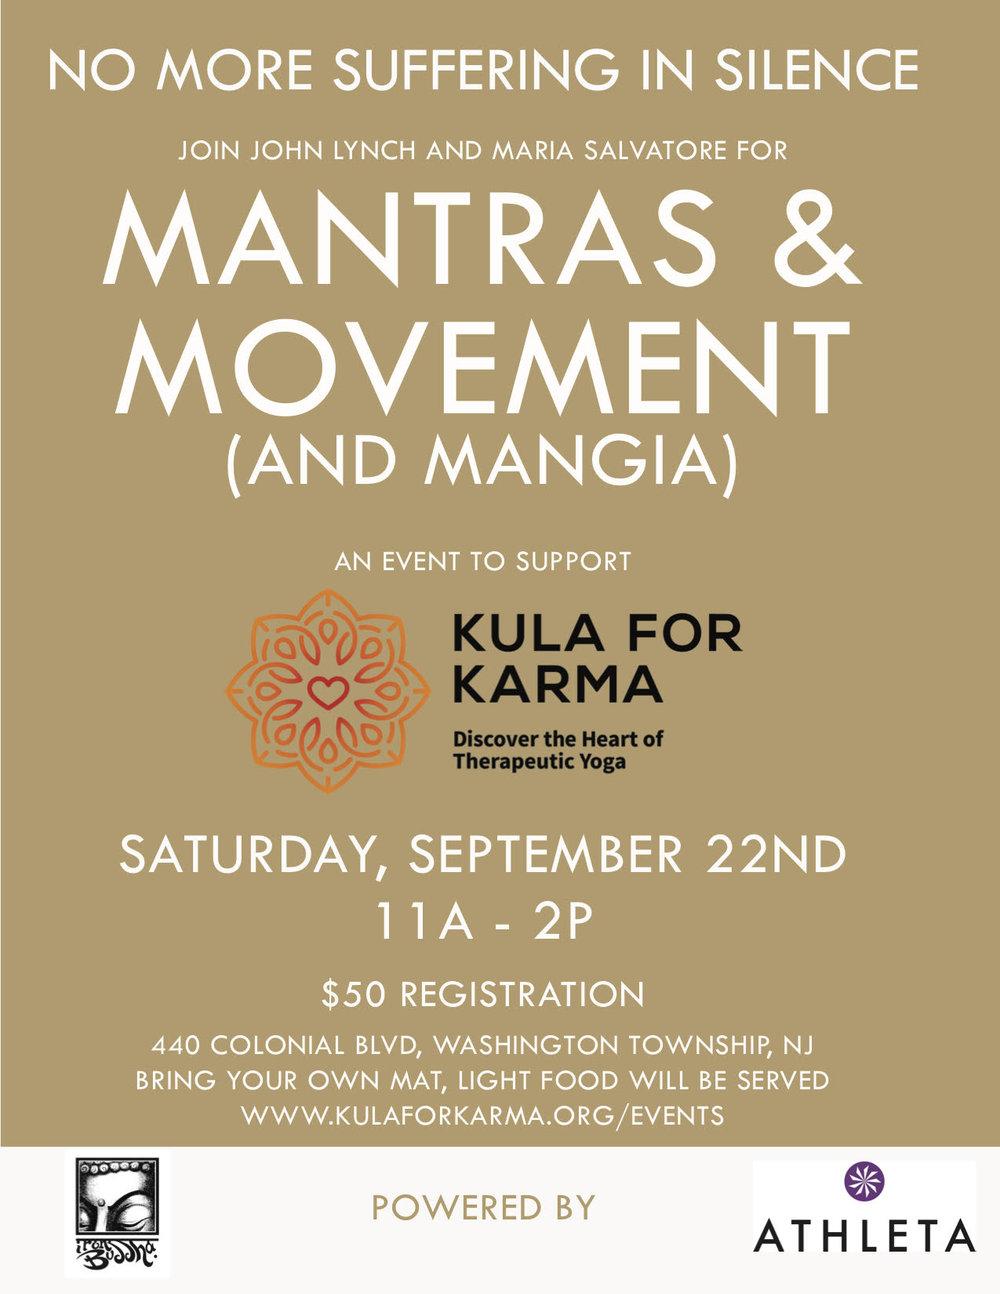 Mantras Movement Mangia.jpg